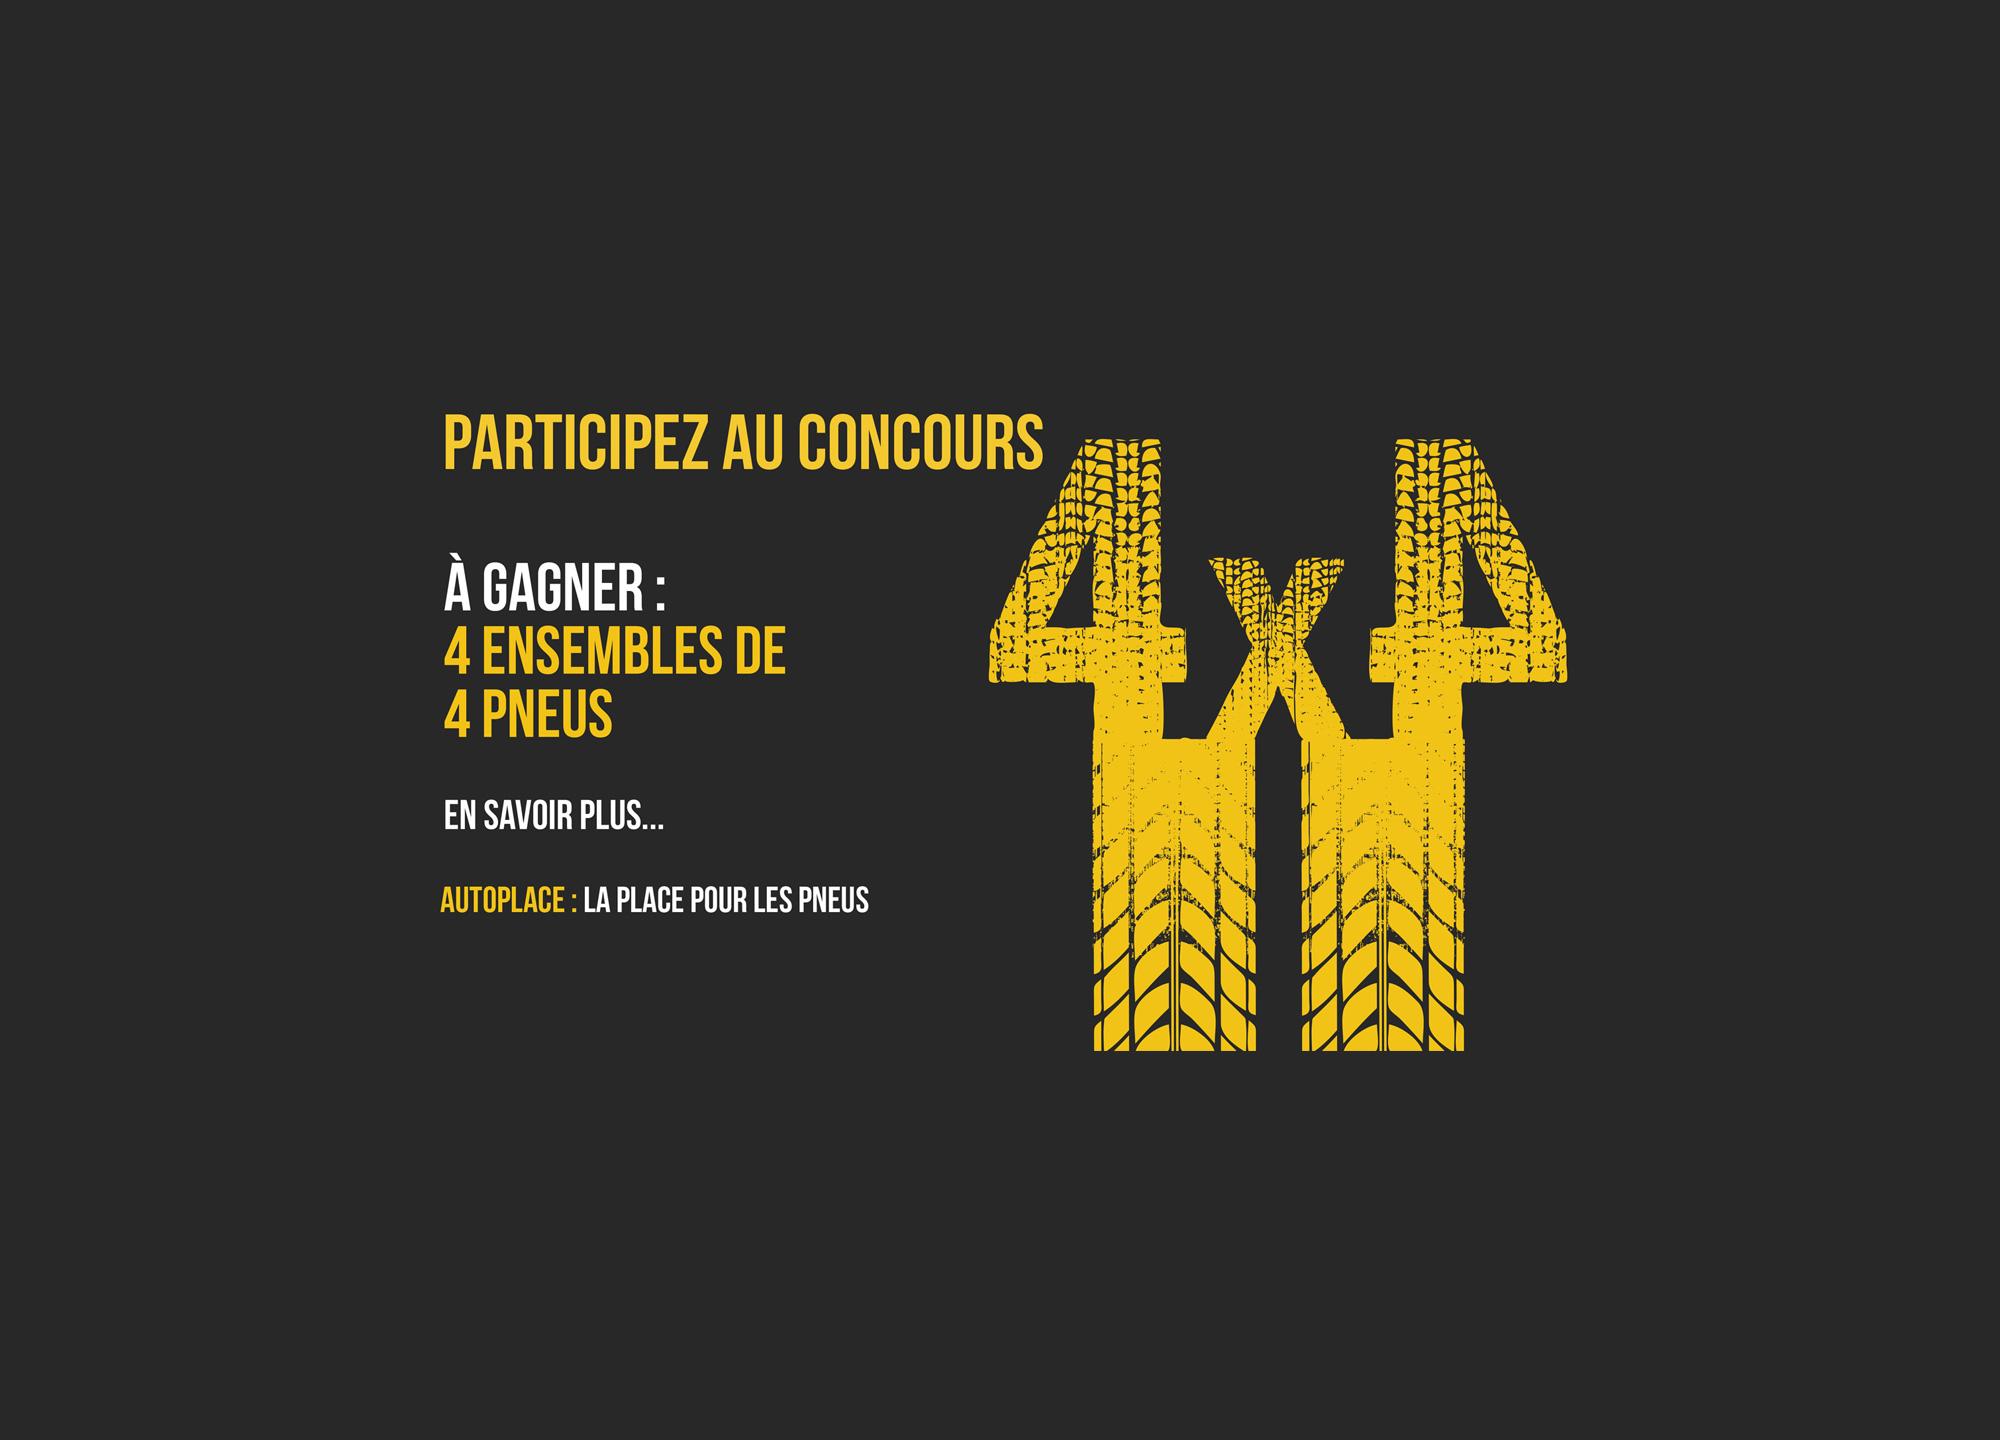 concours-pneus-caroussel-v2